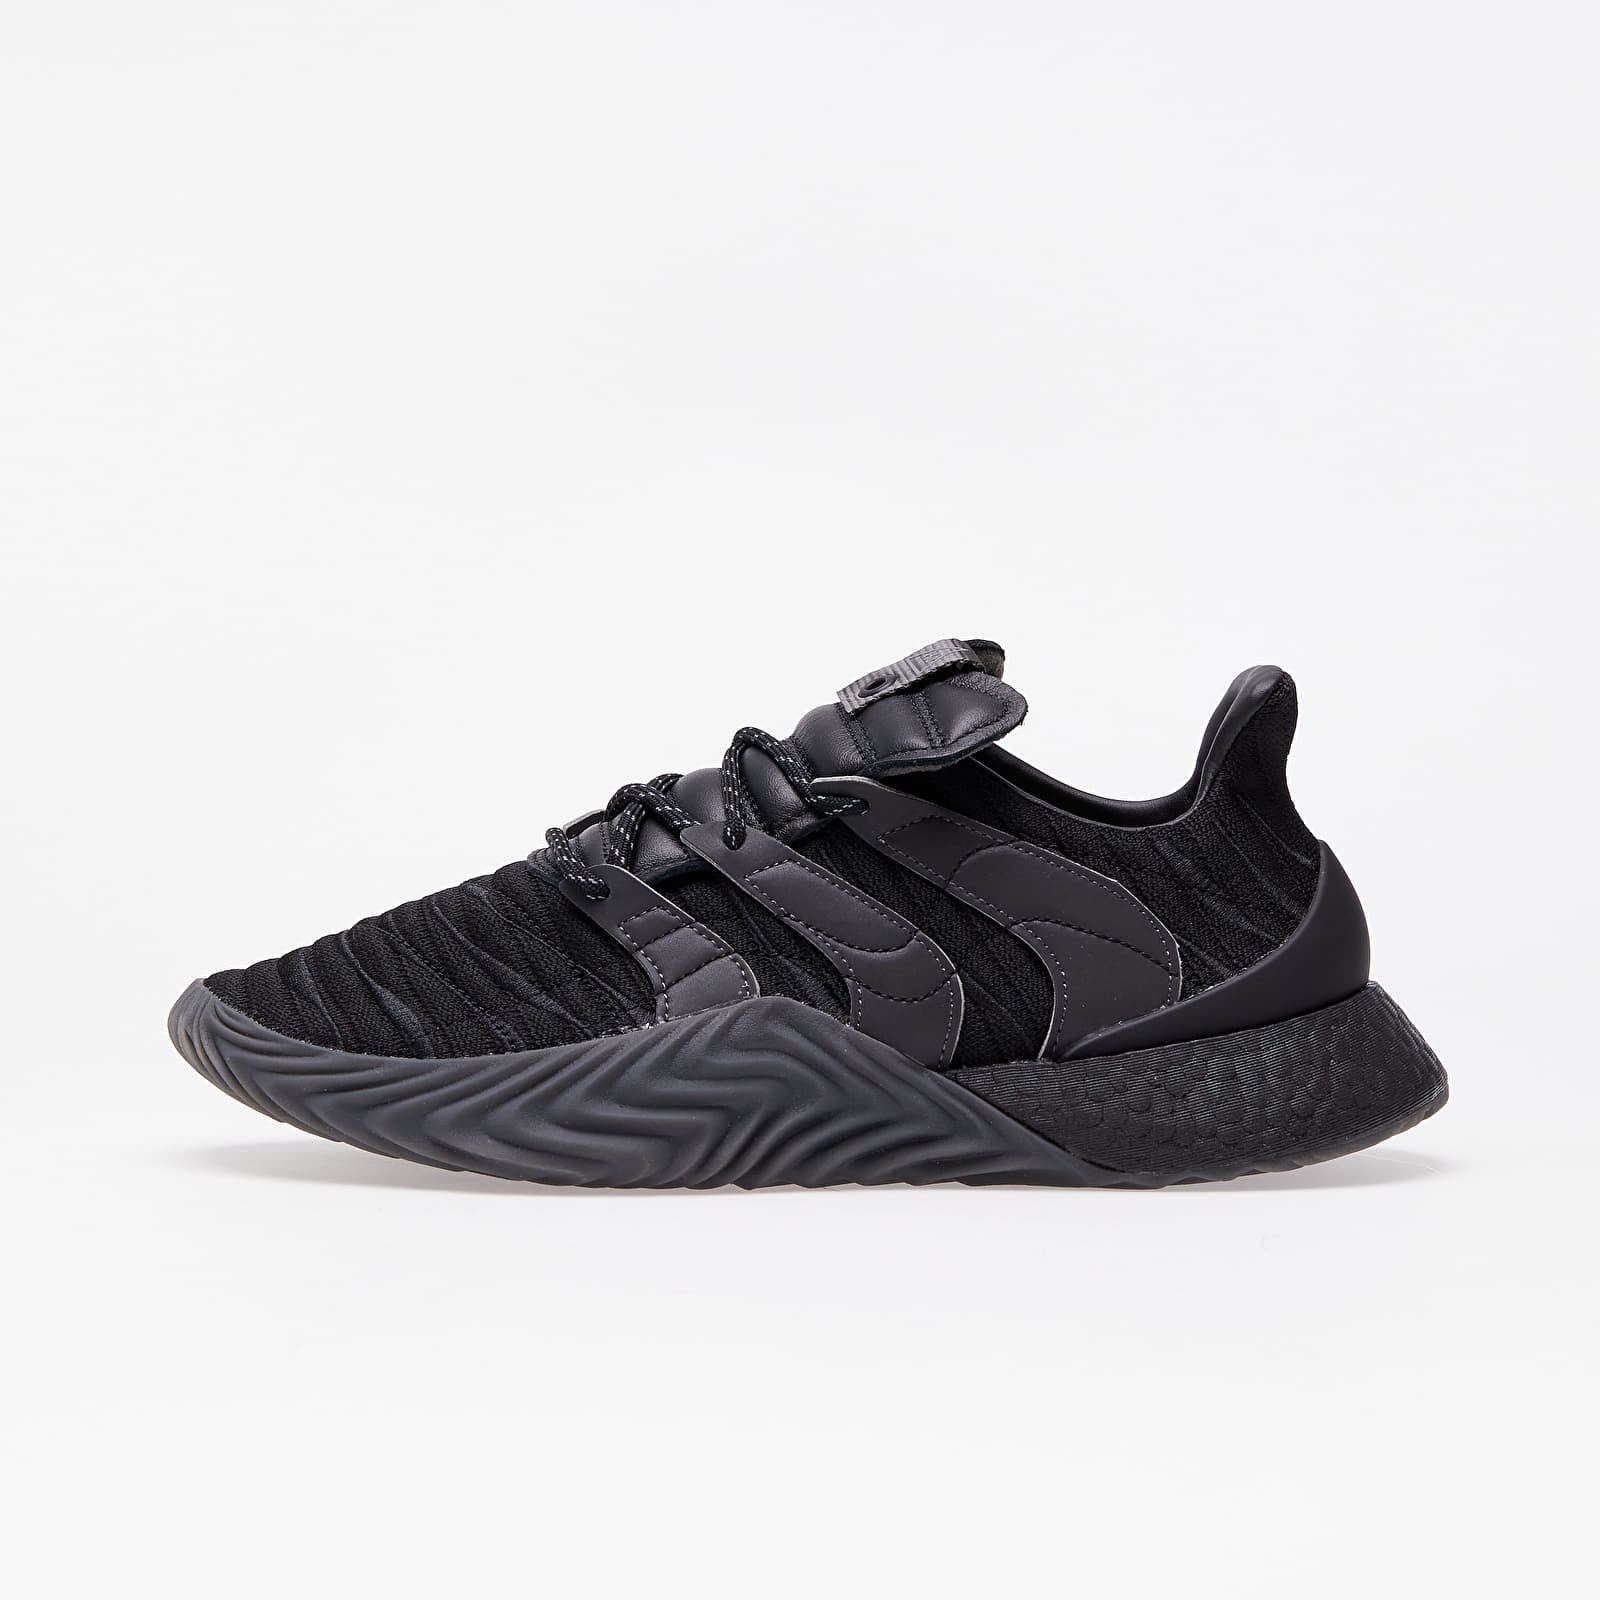 adidas x Pharrell Williams Sobakov 2.0 Core Black/ Utility Black/ Core Black GX2481